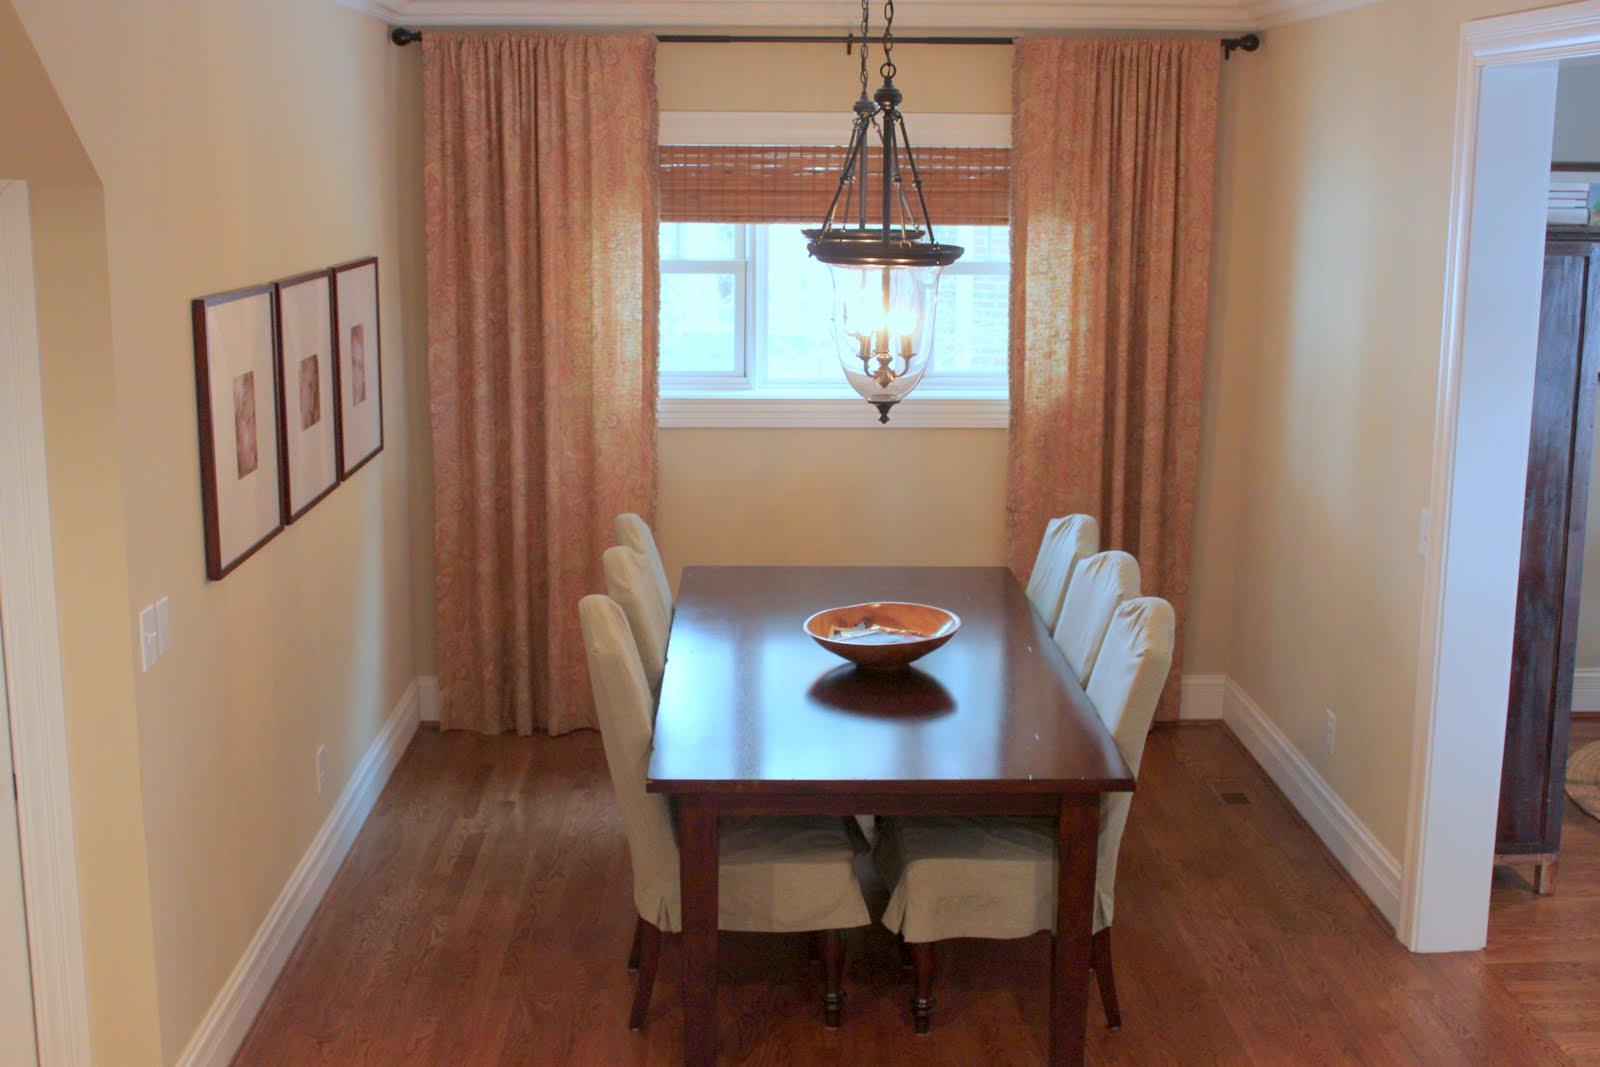 Oak ridge revival kitchen details for 10x10 living room design